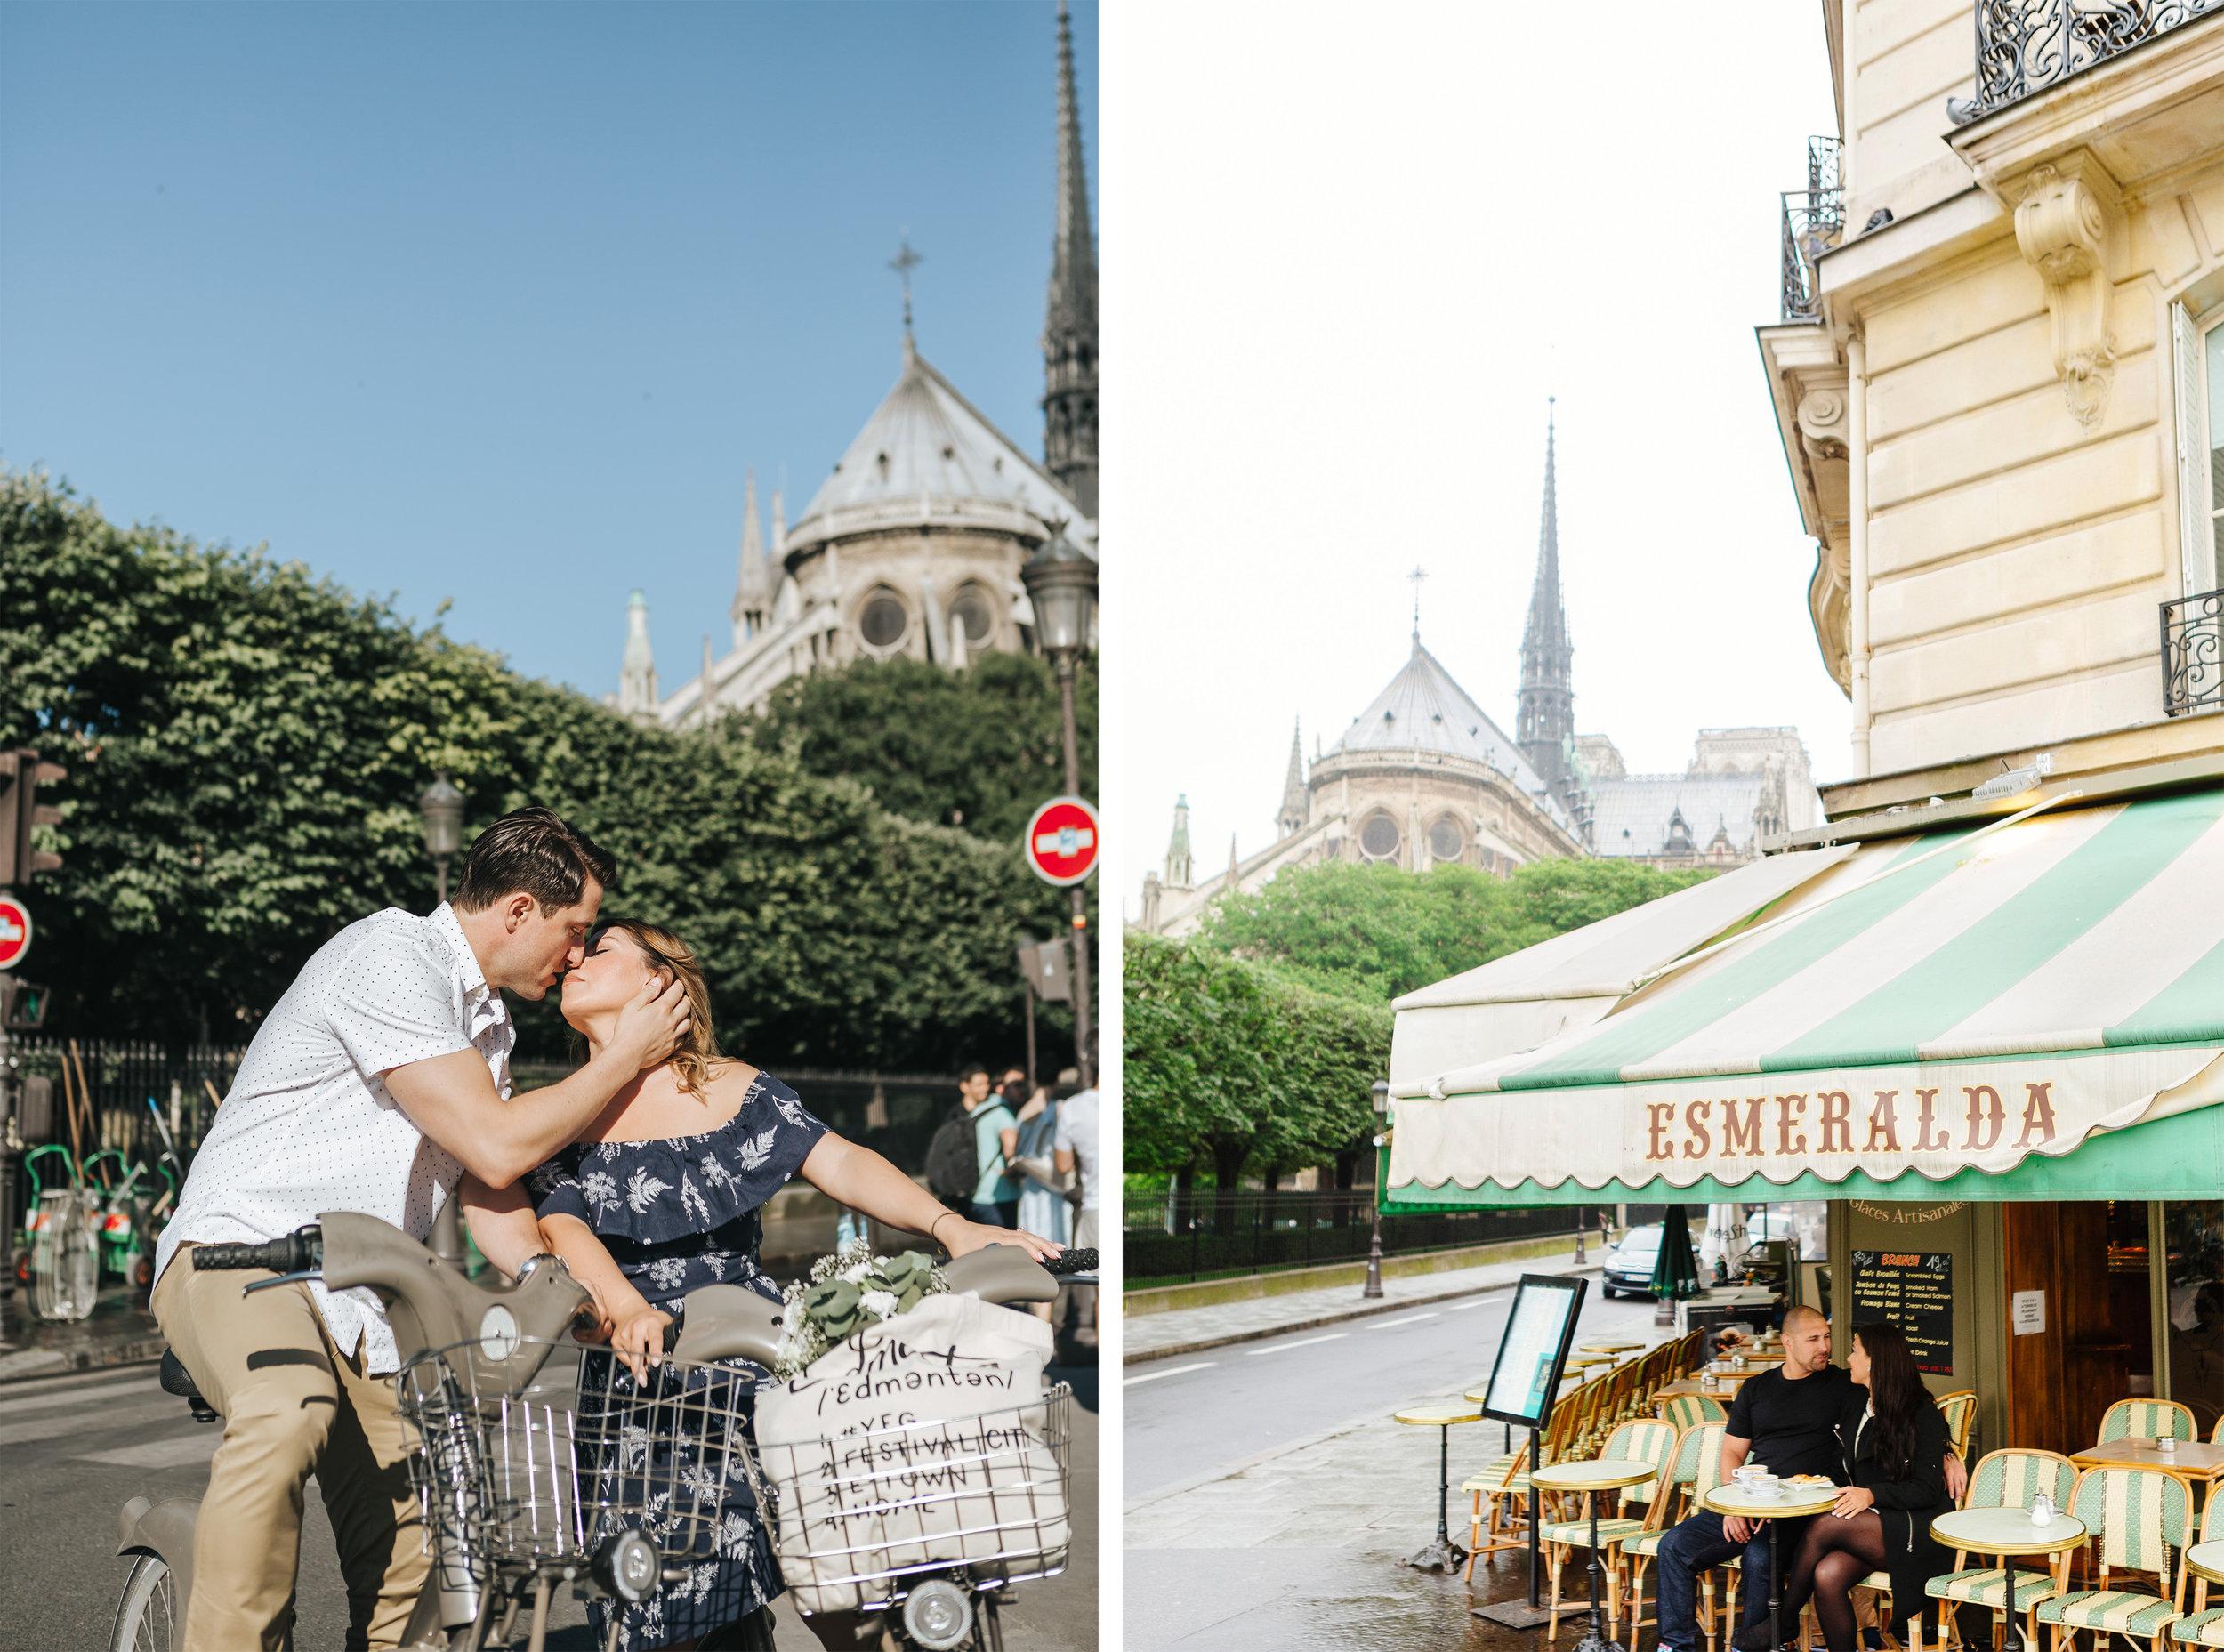 paris photographer diptych couple portraits by notre dame and cafe esmeralda